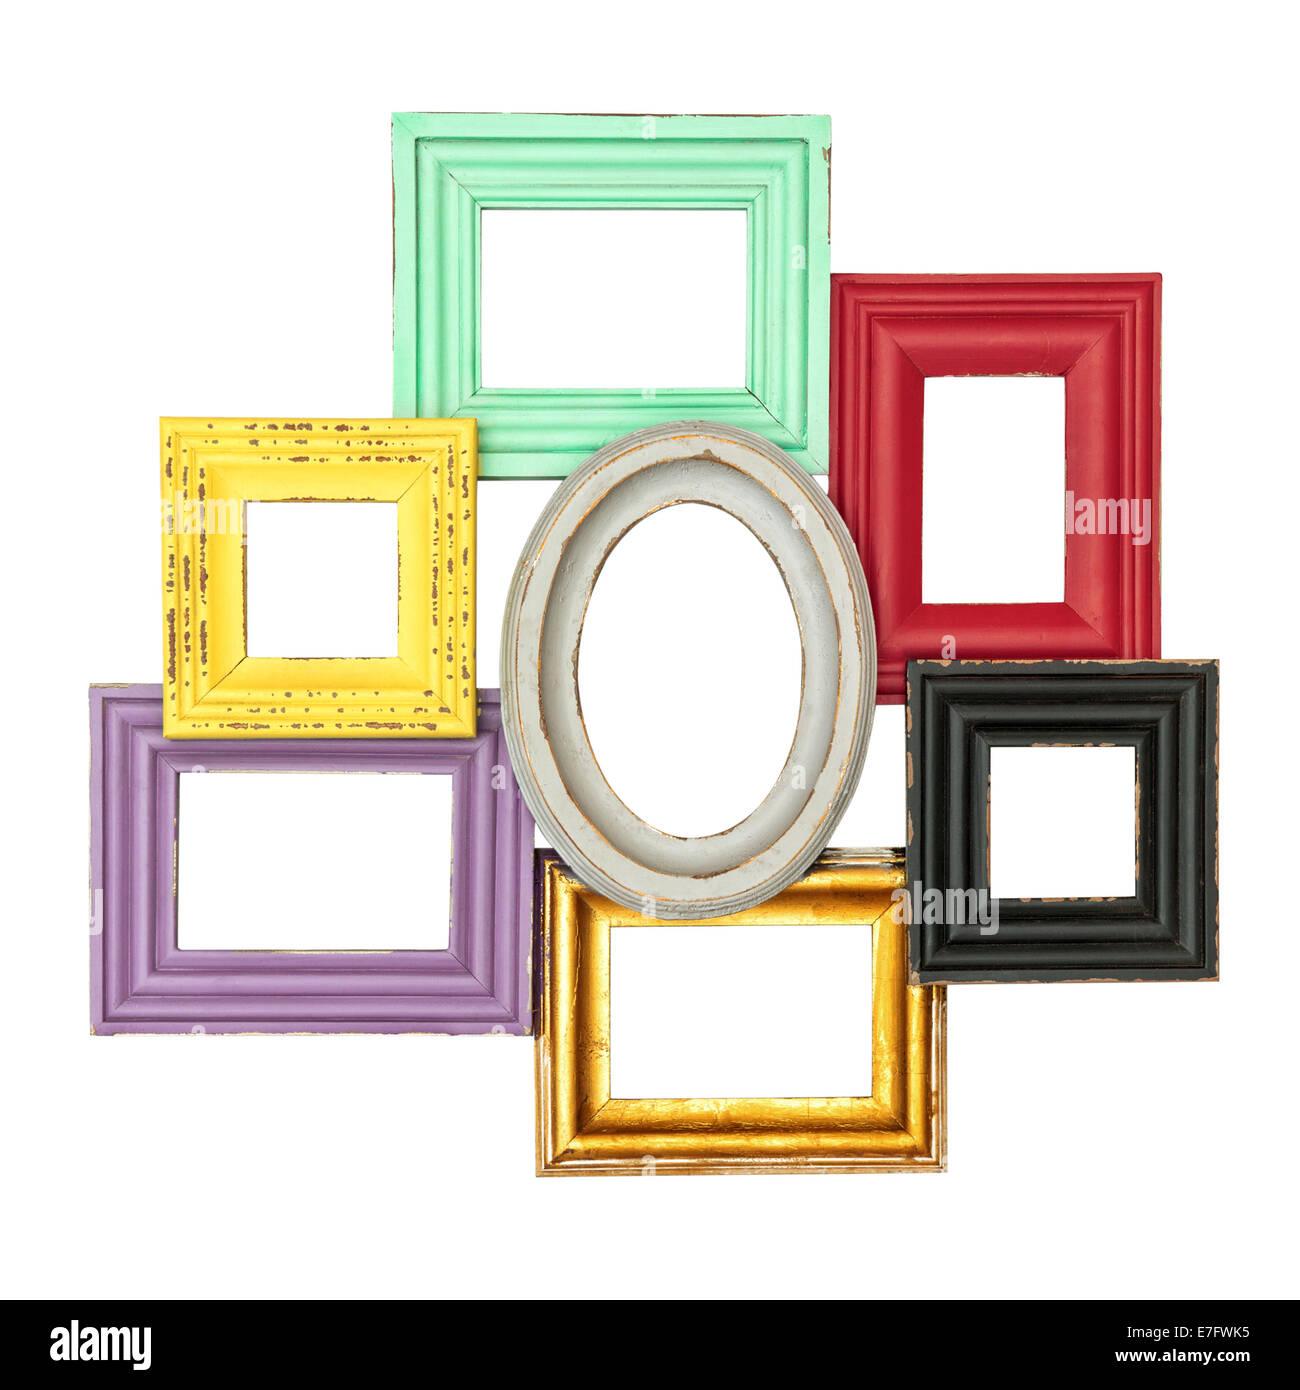 Vintage style multicolor frames for your photo and picture shabby vintage style multicolor frames for your photo and picture shabby chic object isolated on white background jeuxipadfo Images